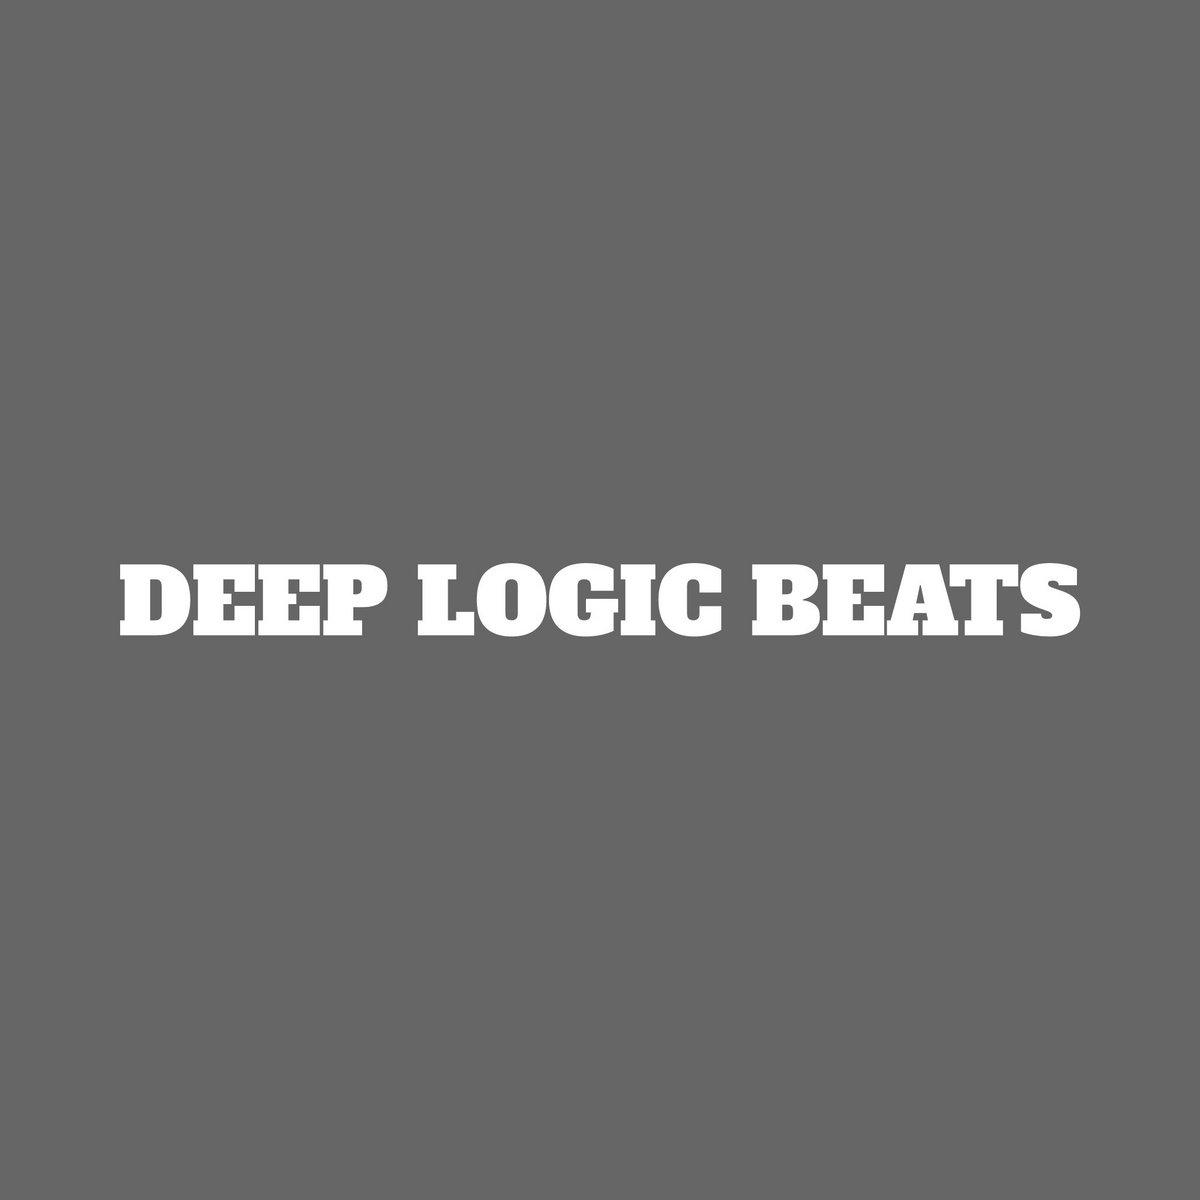 EXCLUSIVE] Slow Trap Beat (130 BPM) | Deep Logic Beats